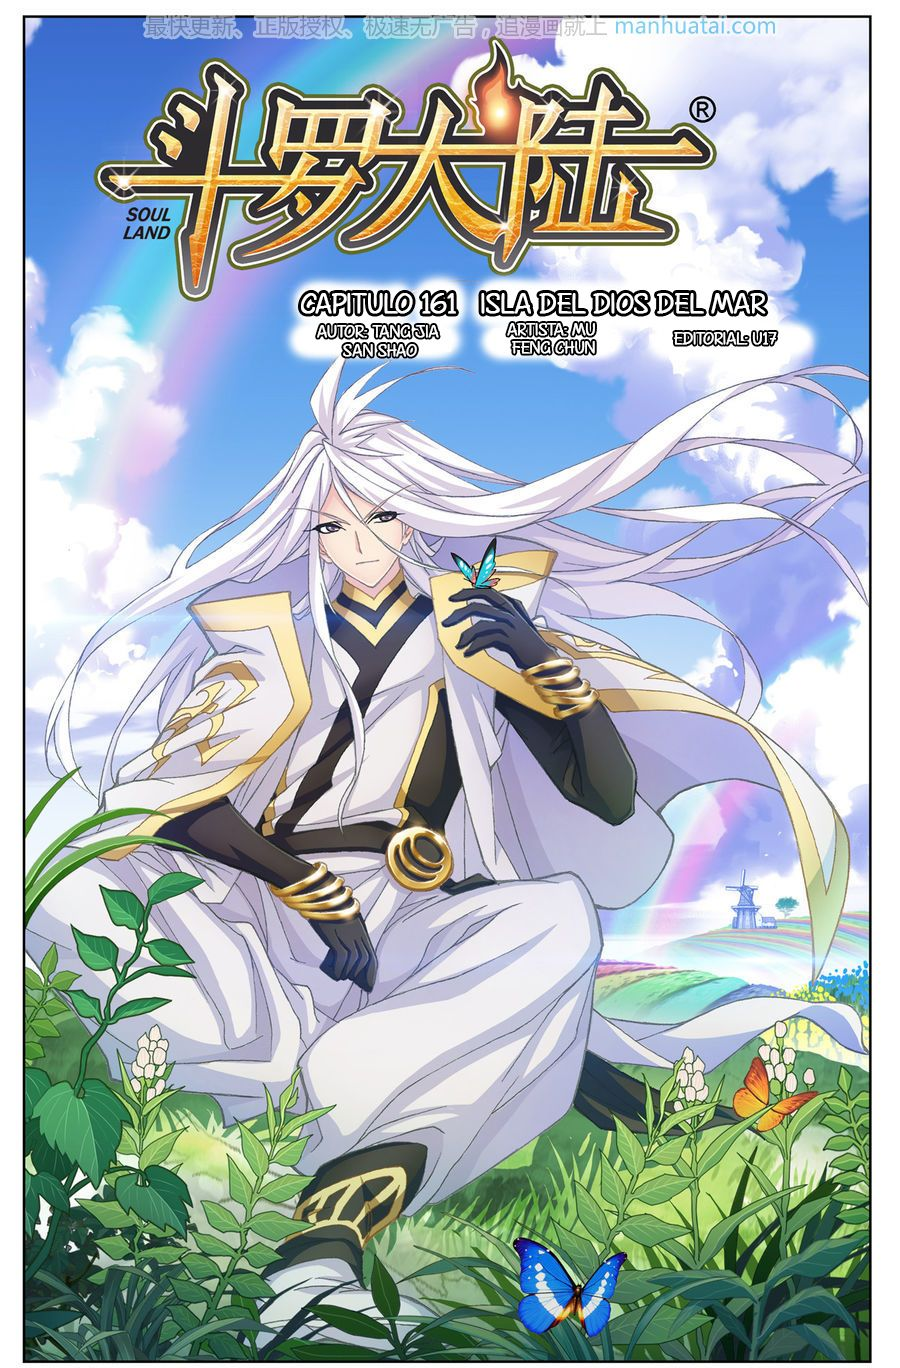 https://c9.mangatag.com/es_manga/pic3/18/16210/590565/fed33392d3a48aa149a87a38b875ba4a.jpg Page 2